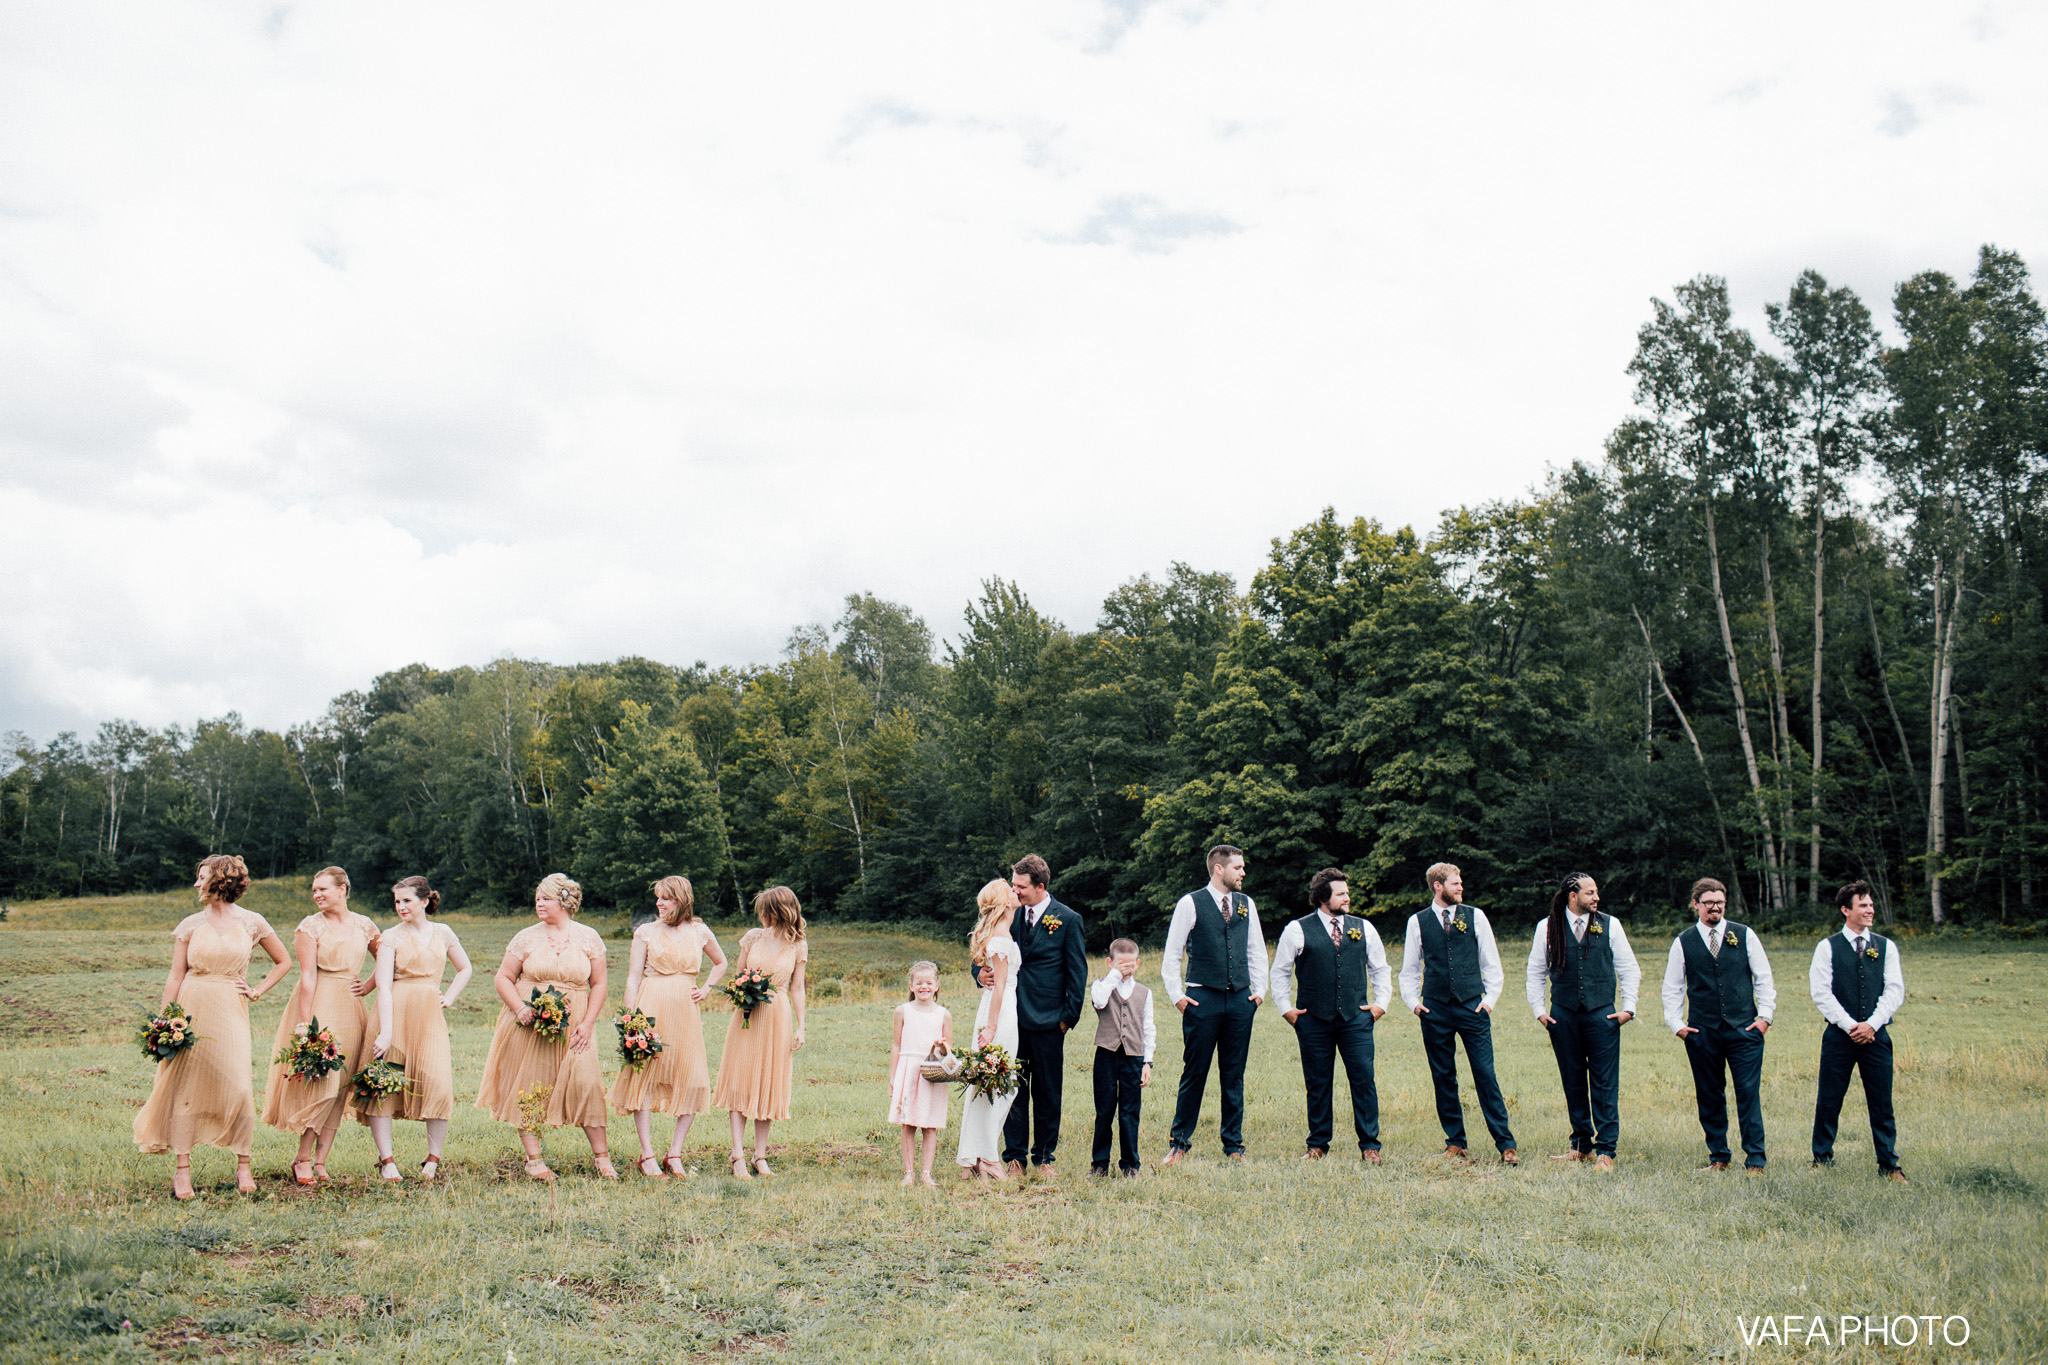 Belsolda-Farm-Wedding-Christy-Eric-Vafa-Photo-233.jpg